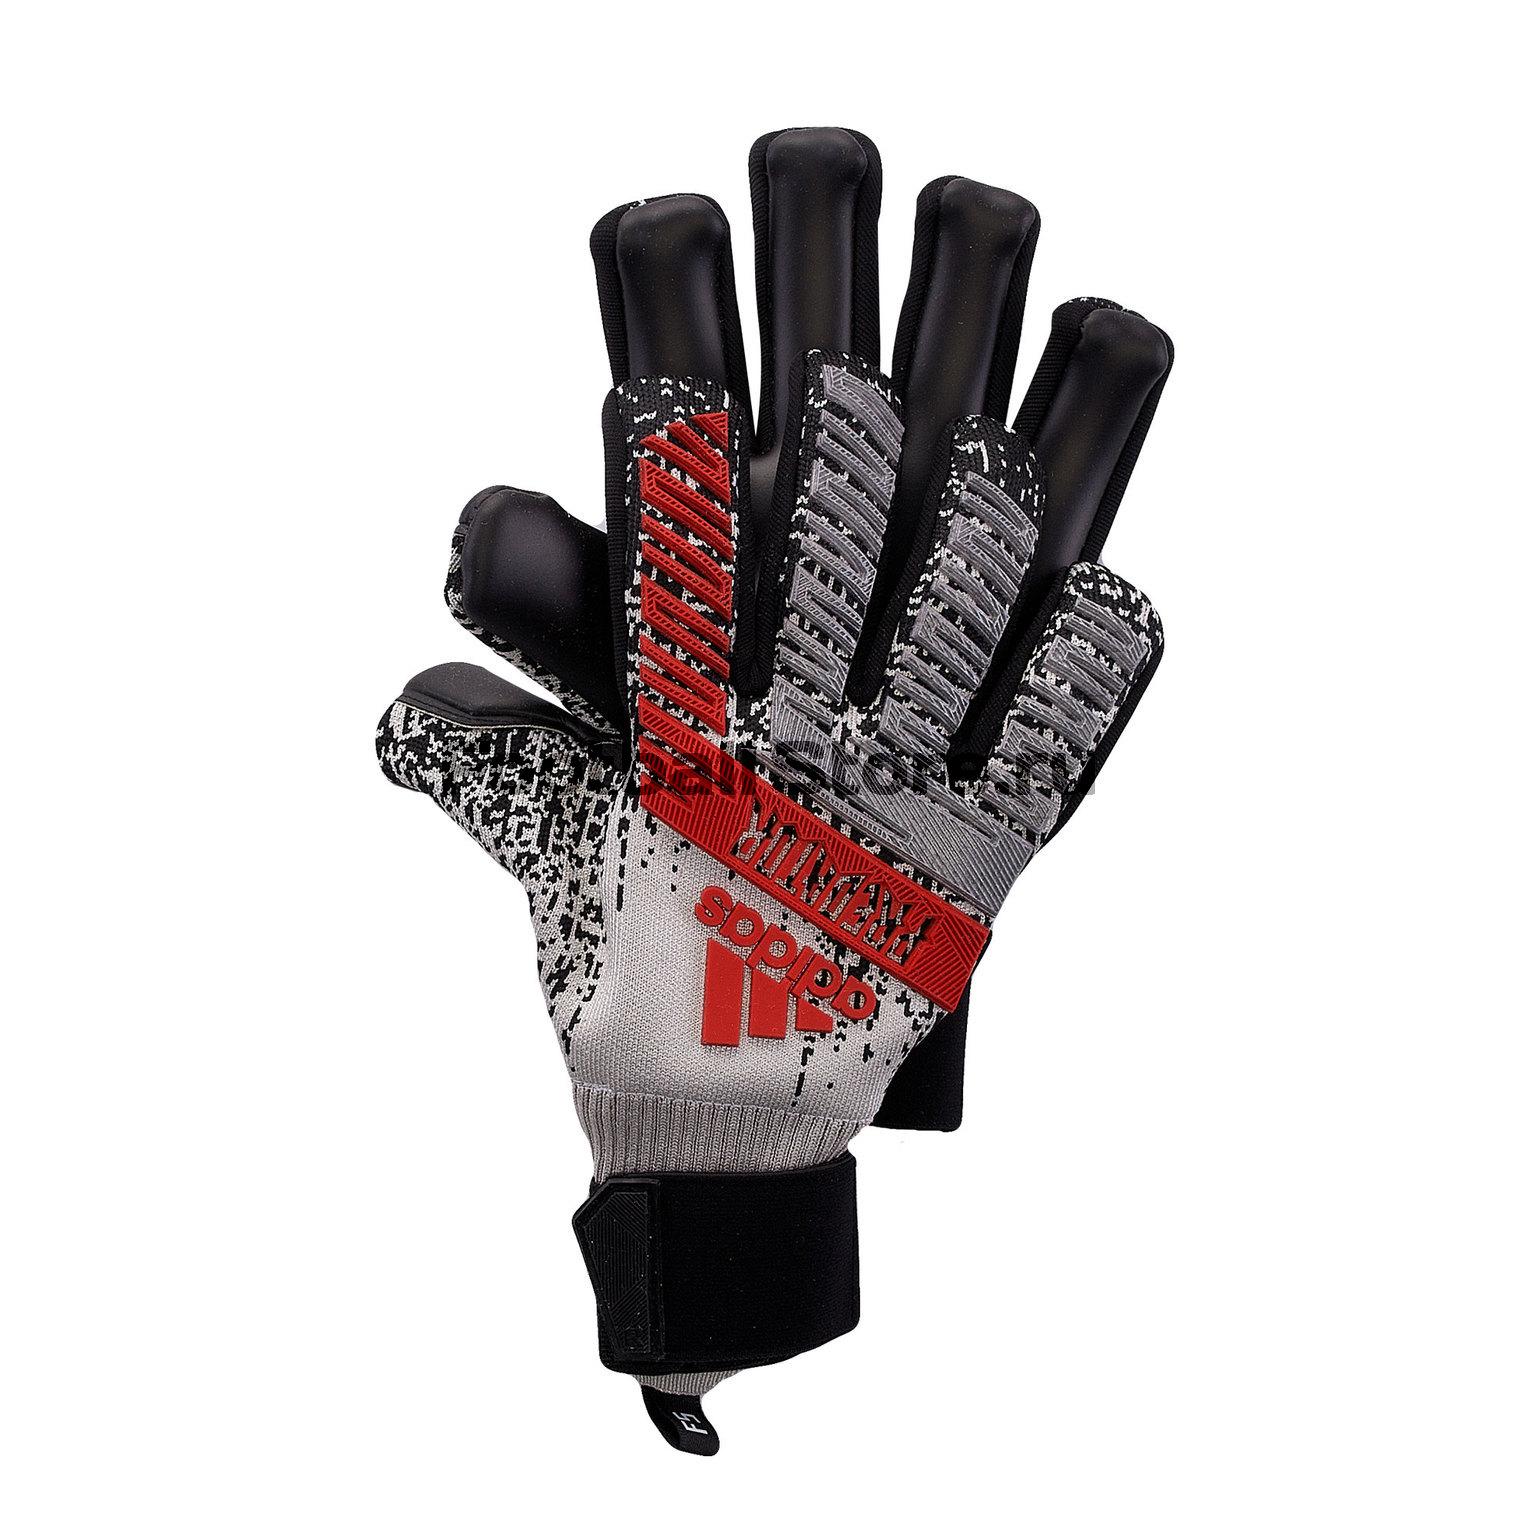 купить Перчатки вратарские Adidas Predaror Pro FS DY2599 недорого